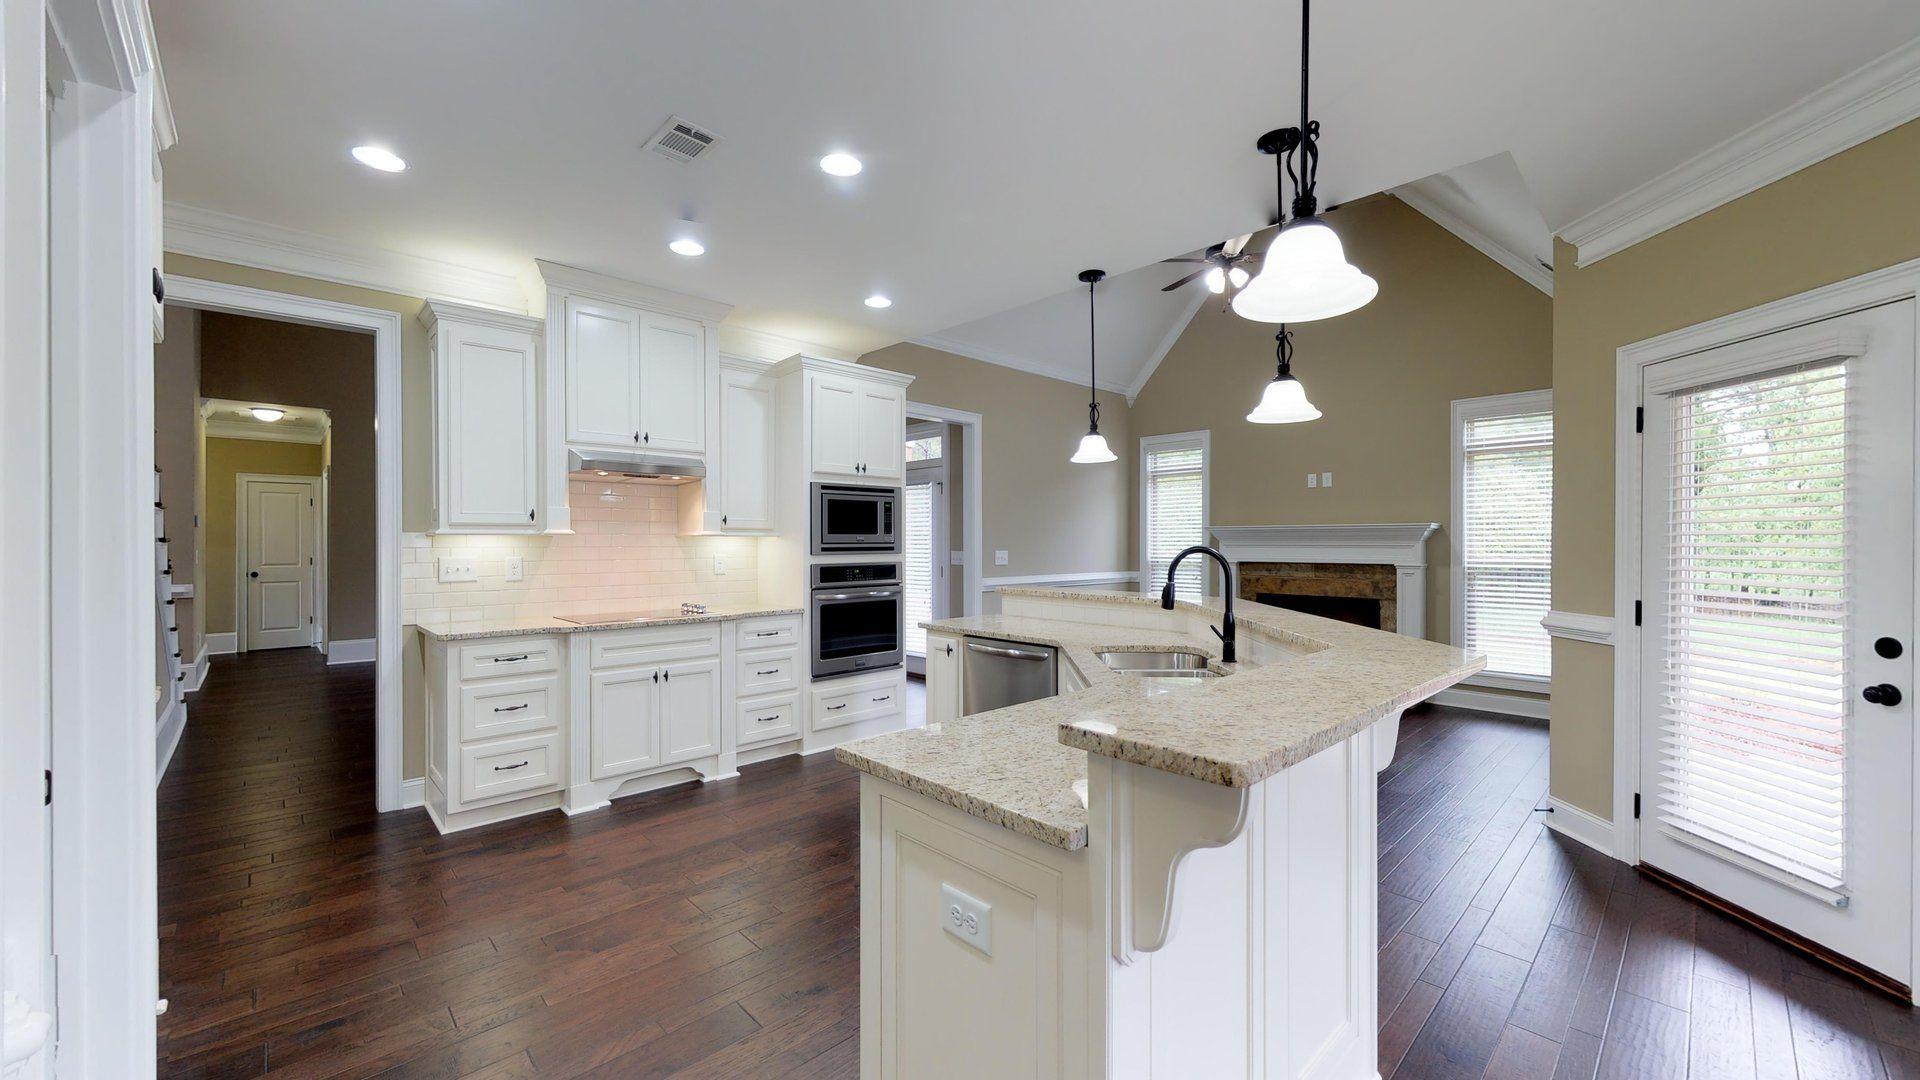 Explore Frank Betz Associates Candler Park House Plan In 3d House Plans Park Homes House